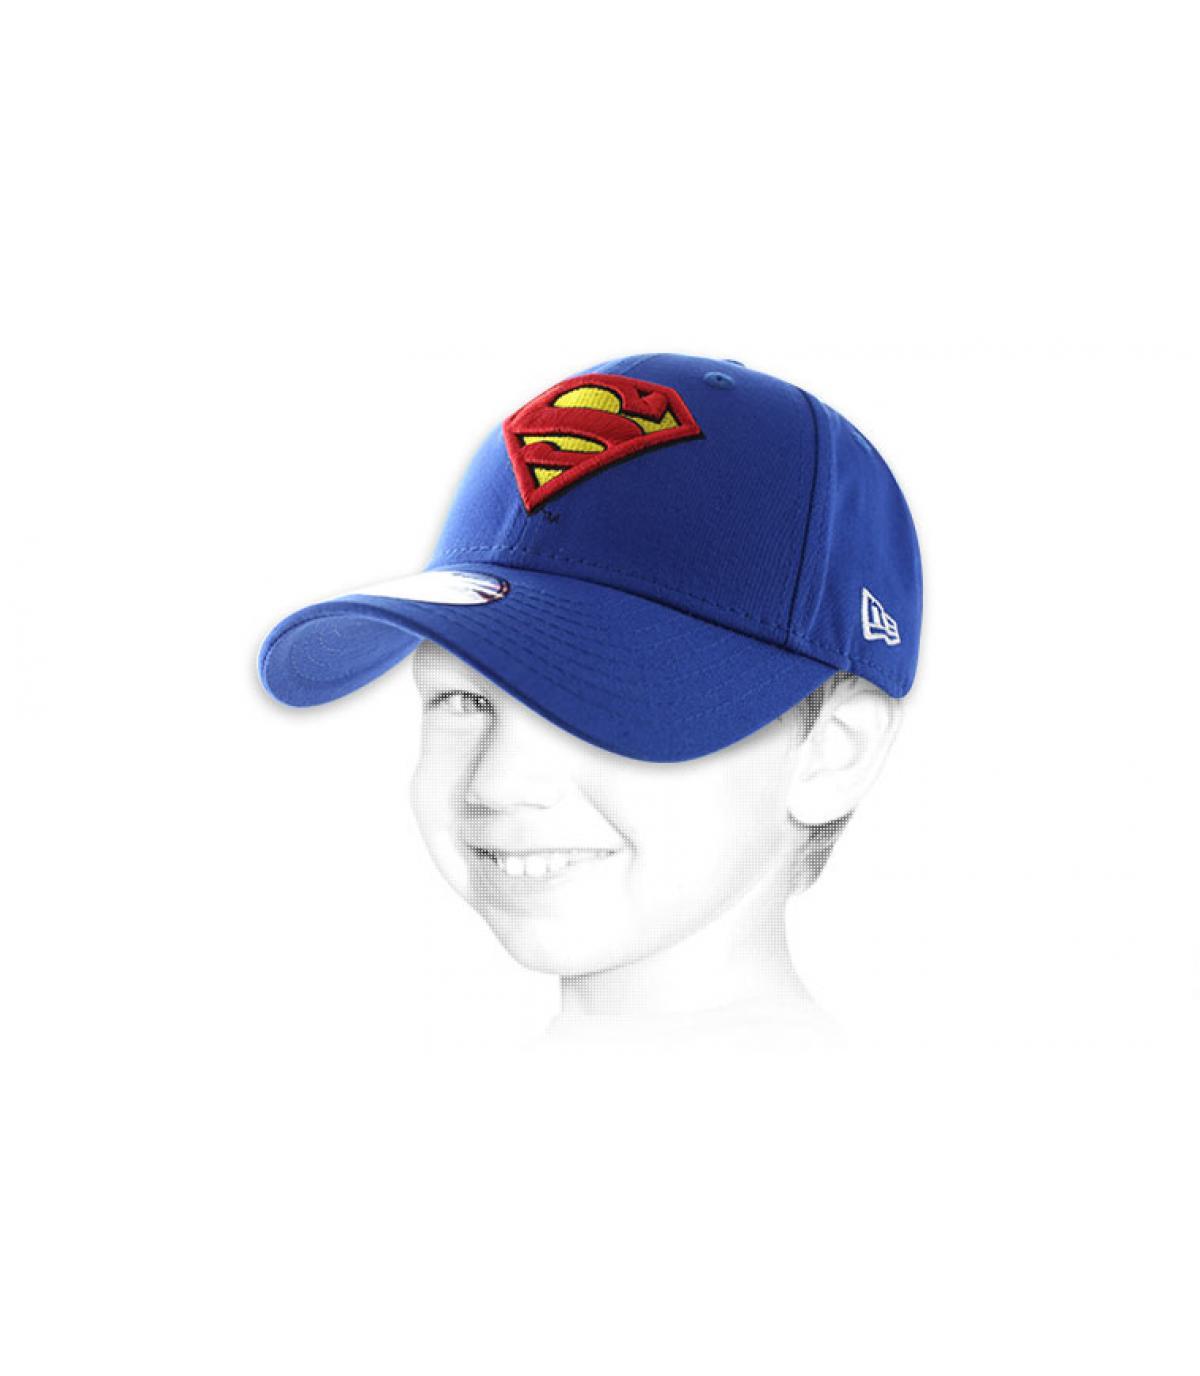 Superman cap kid size